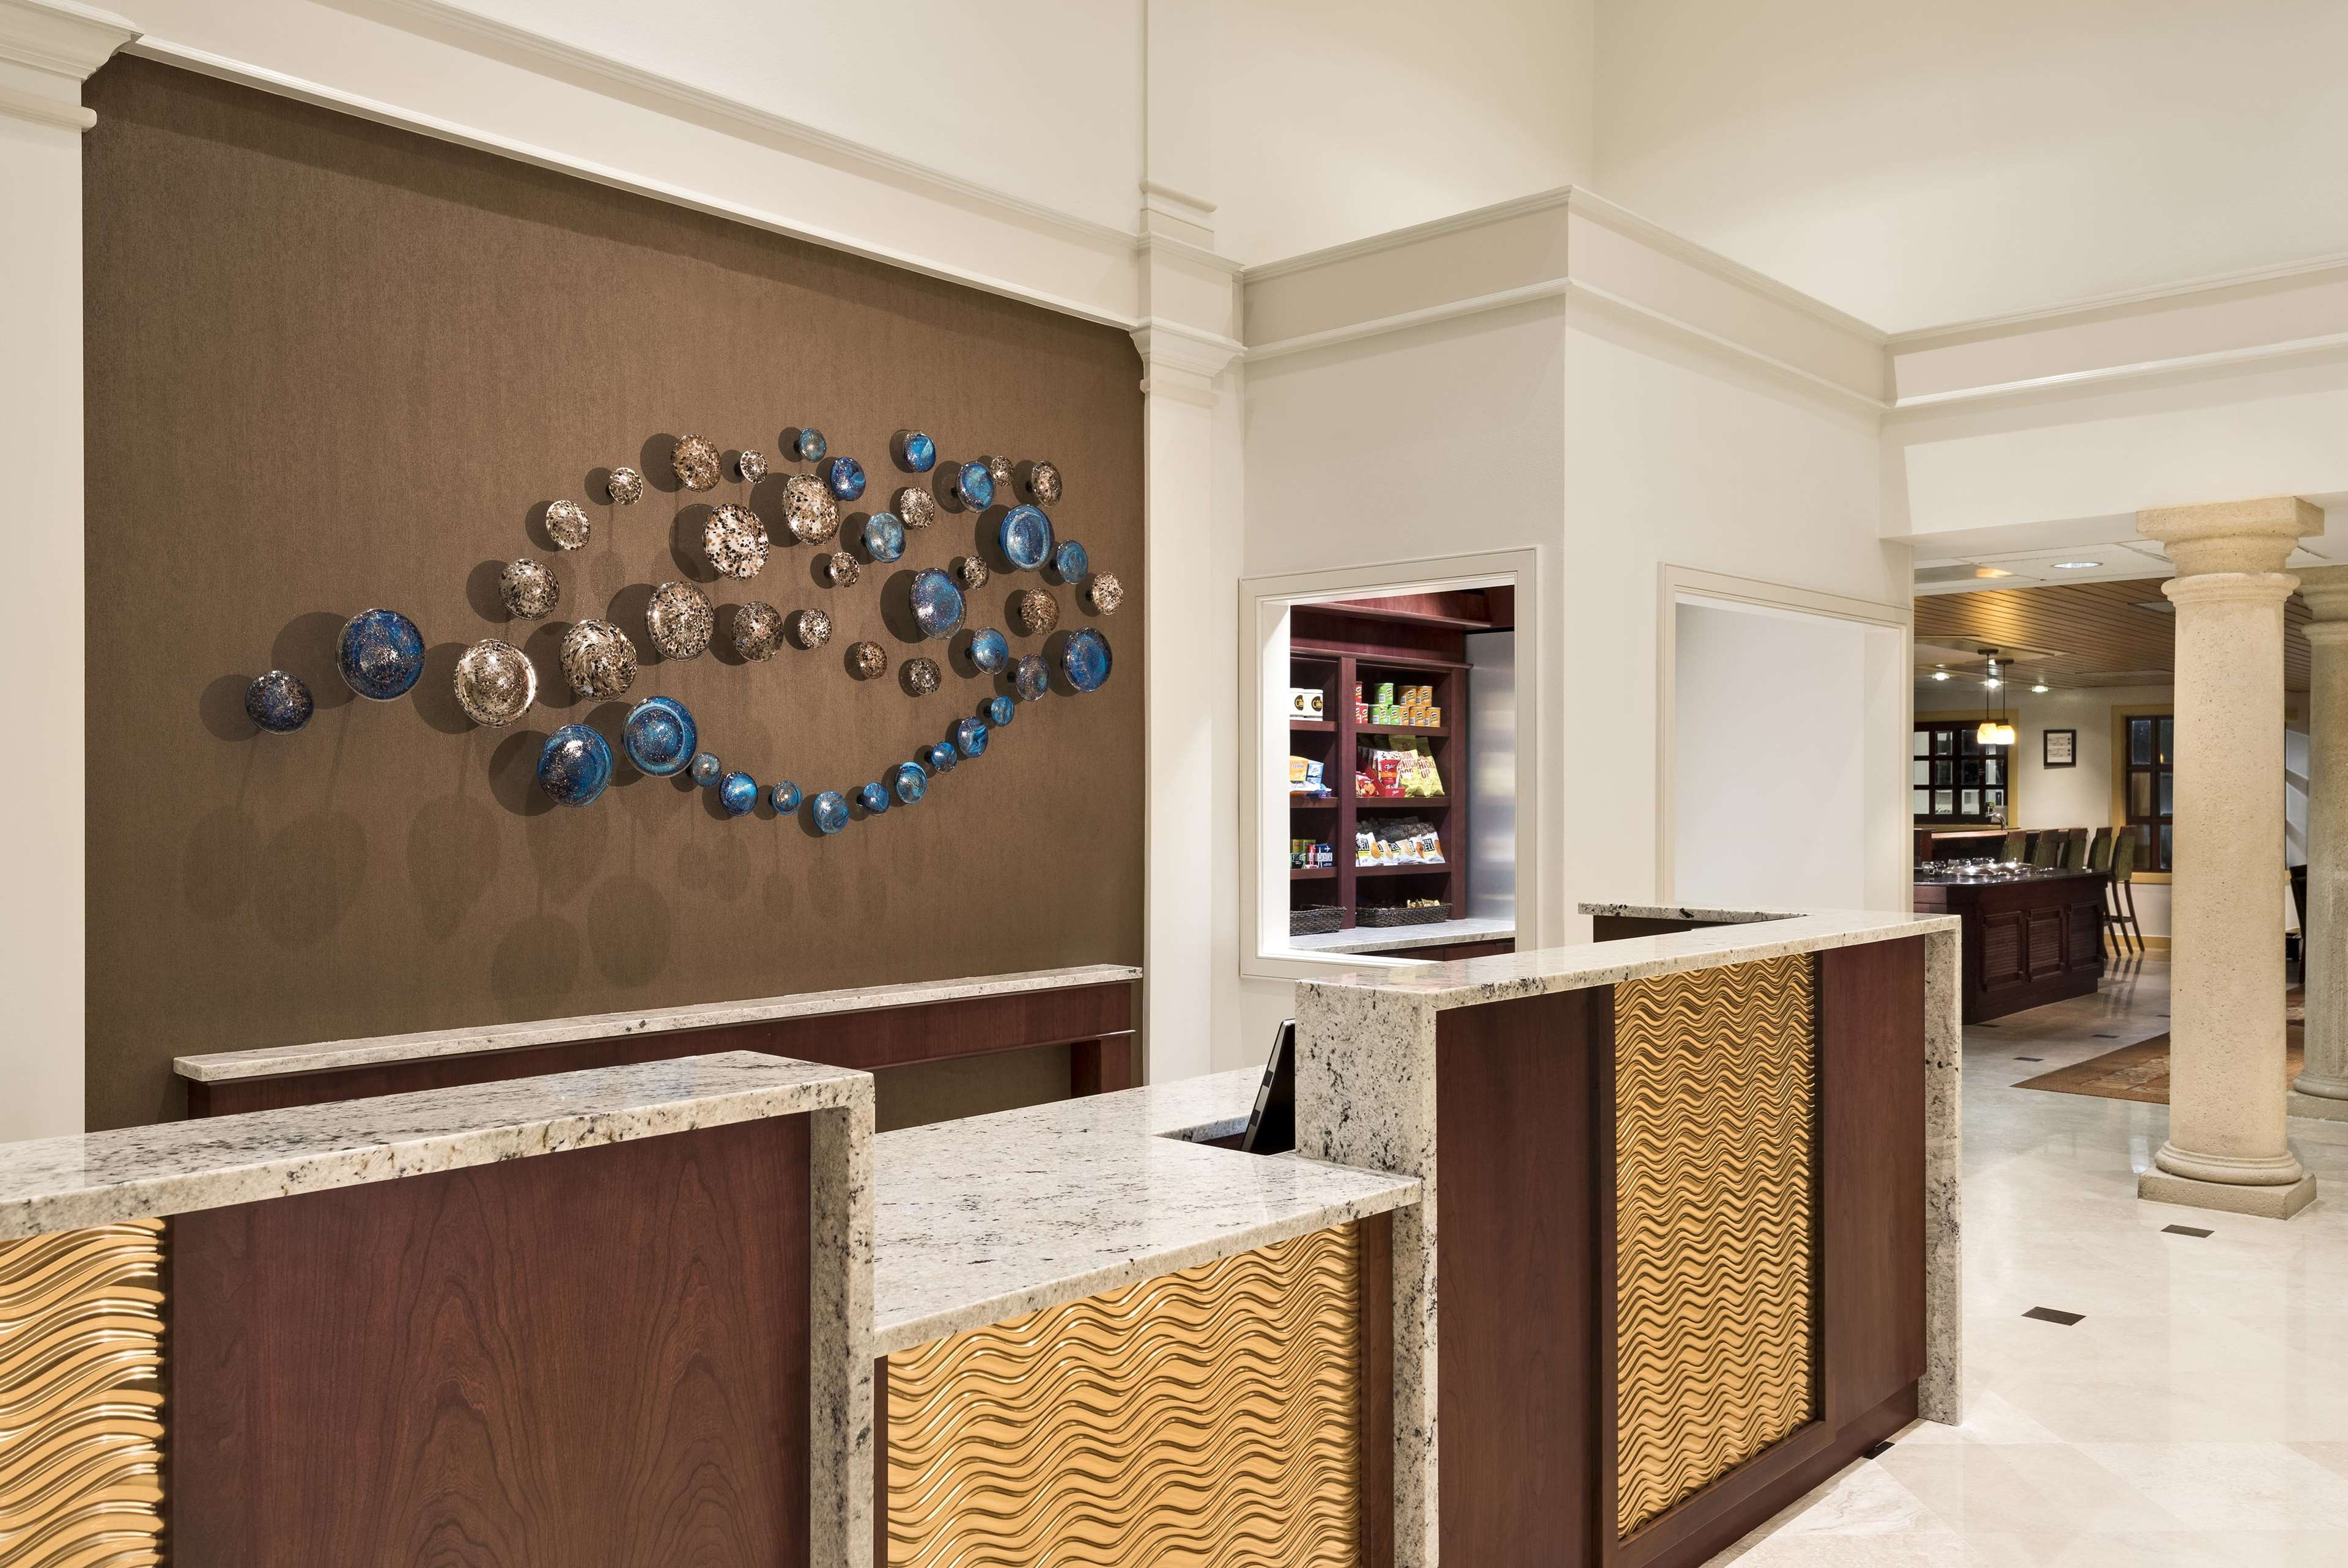 DoubleTree Suites by Hilton Hotel Naples image 7